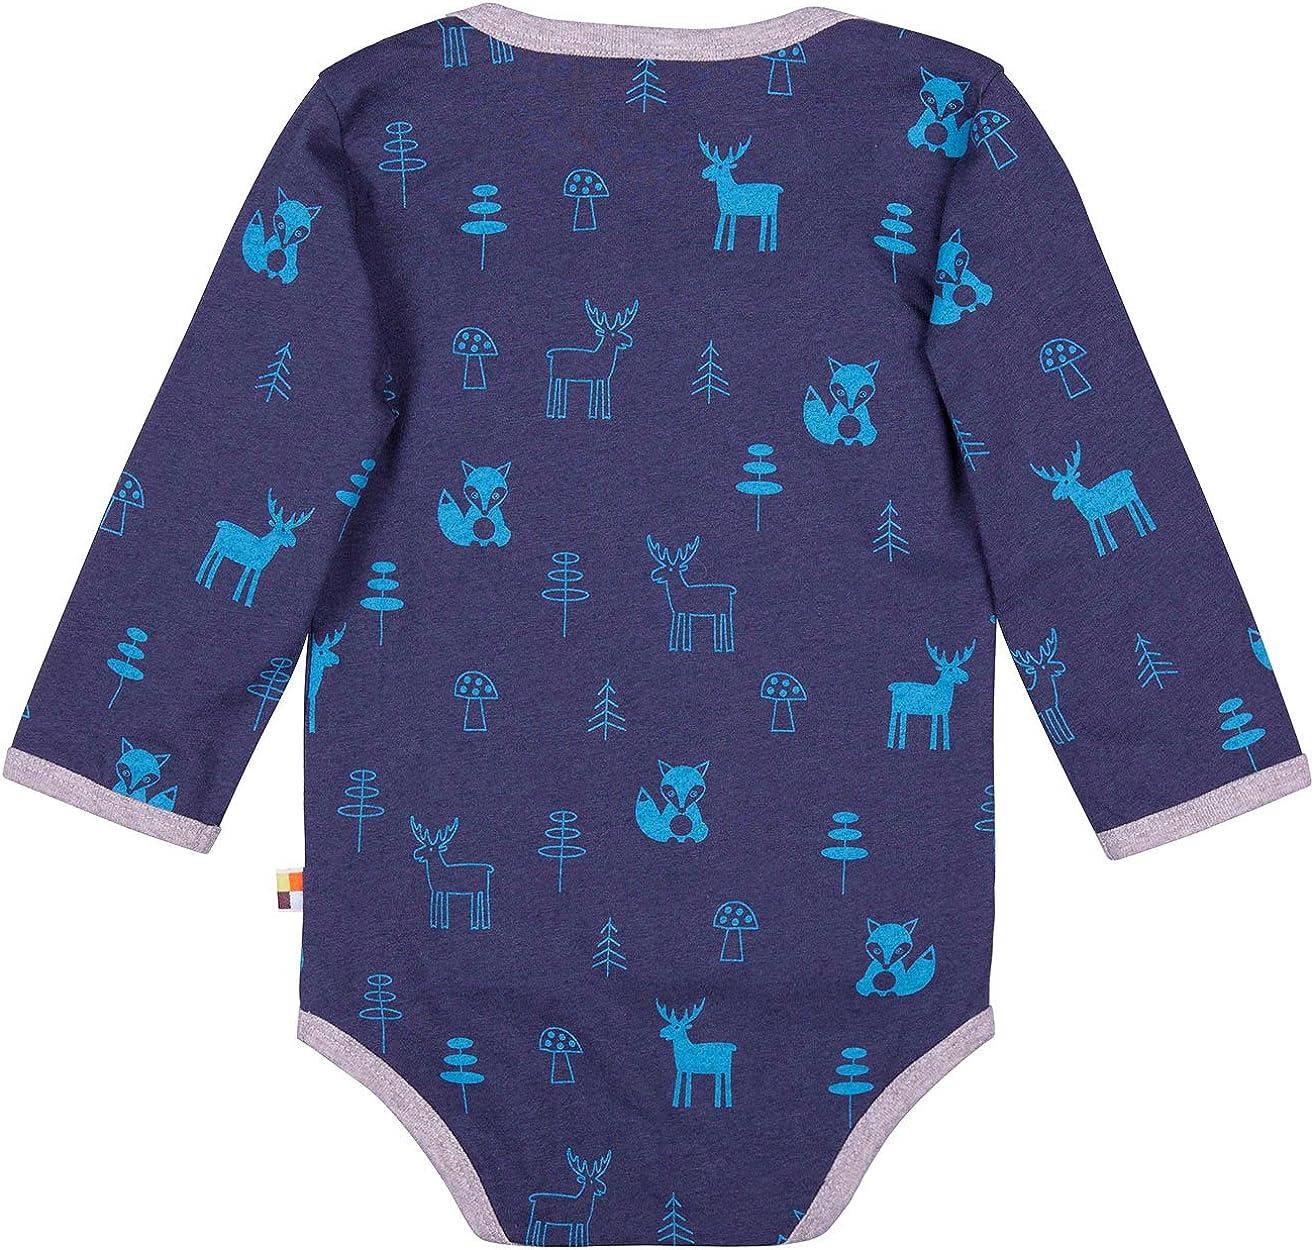 Druck Body proud Unisex Baby Woll-Anteil loud